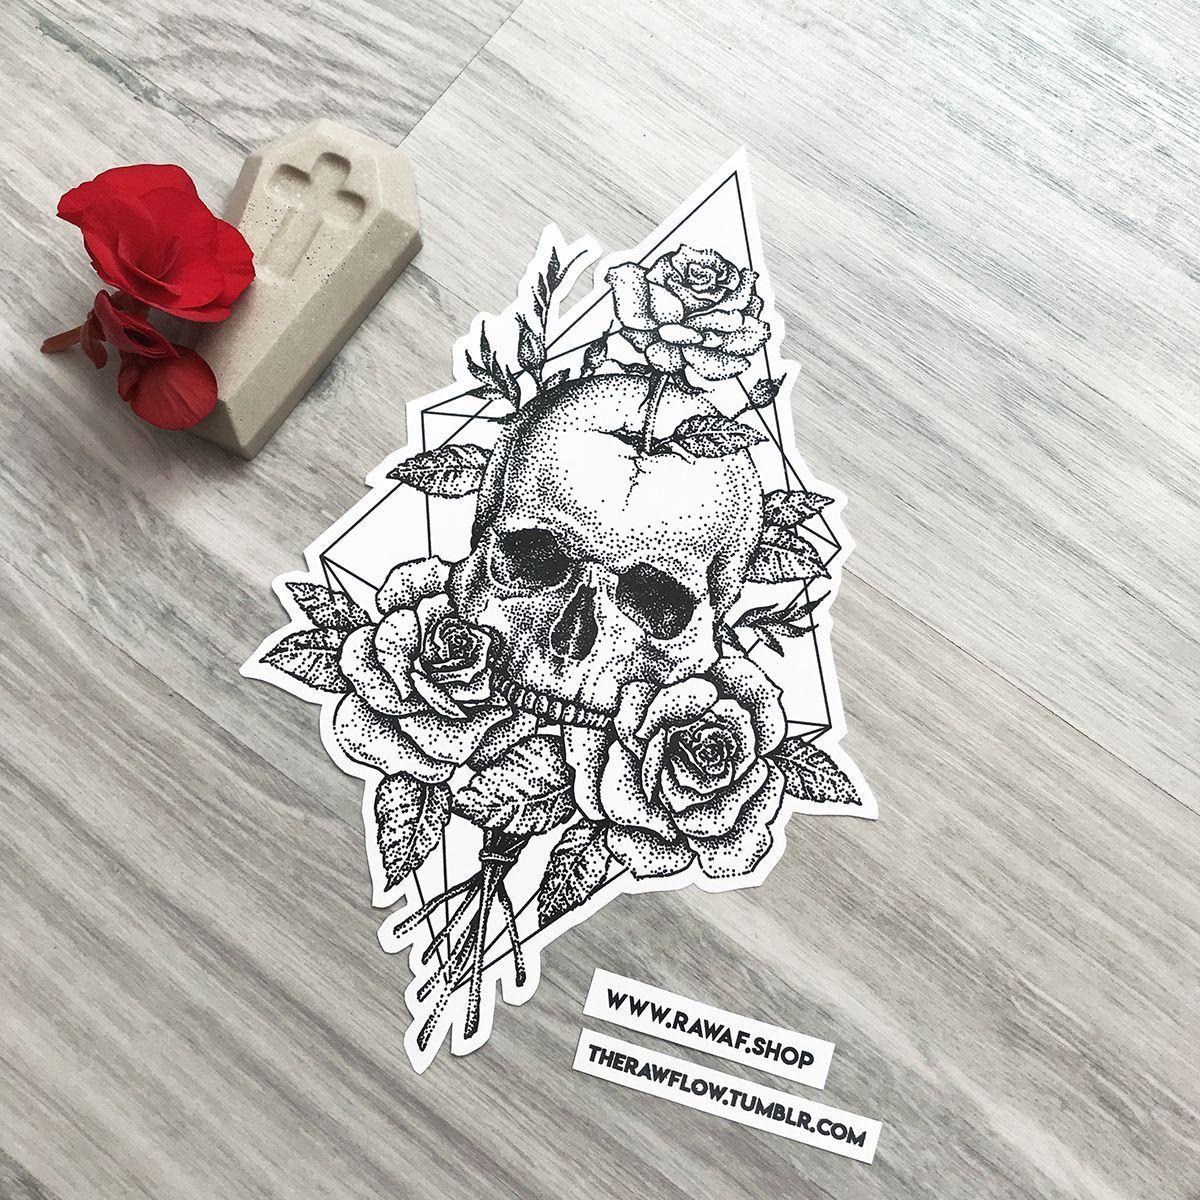 Dotwork Craneo Rosas Rose Diseno Del Tatuaje Descarga Ahora O Comision Mi Www Rawaf Shop Tattoo In 2020 Skull Rose Tattoos Skull Tattoo Design Rose Tattoos